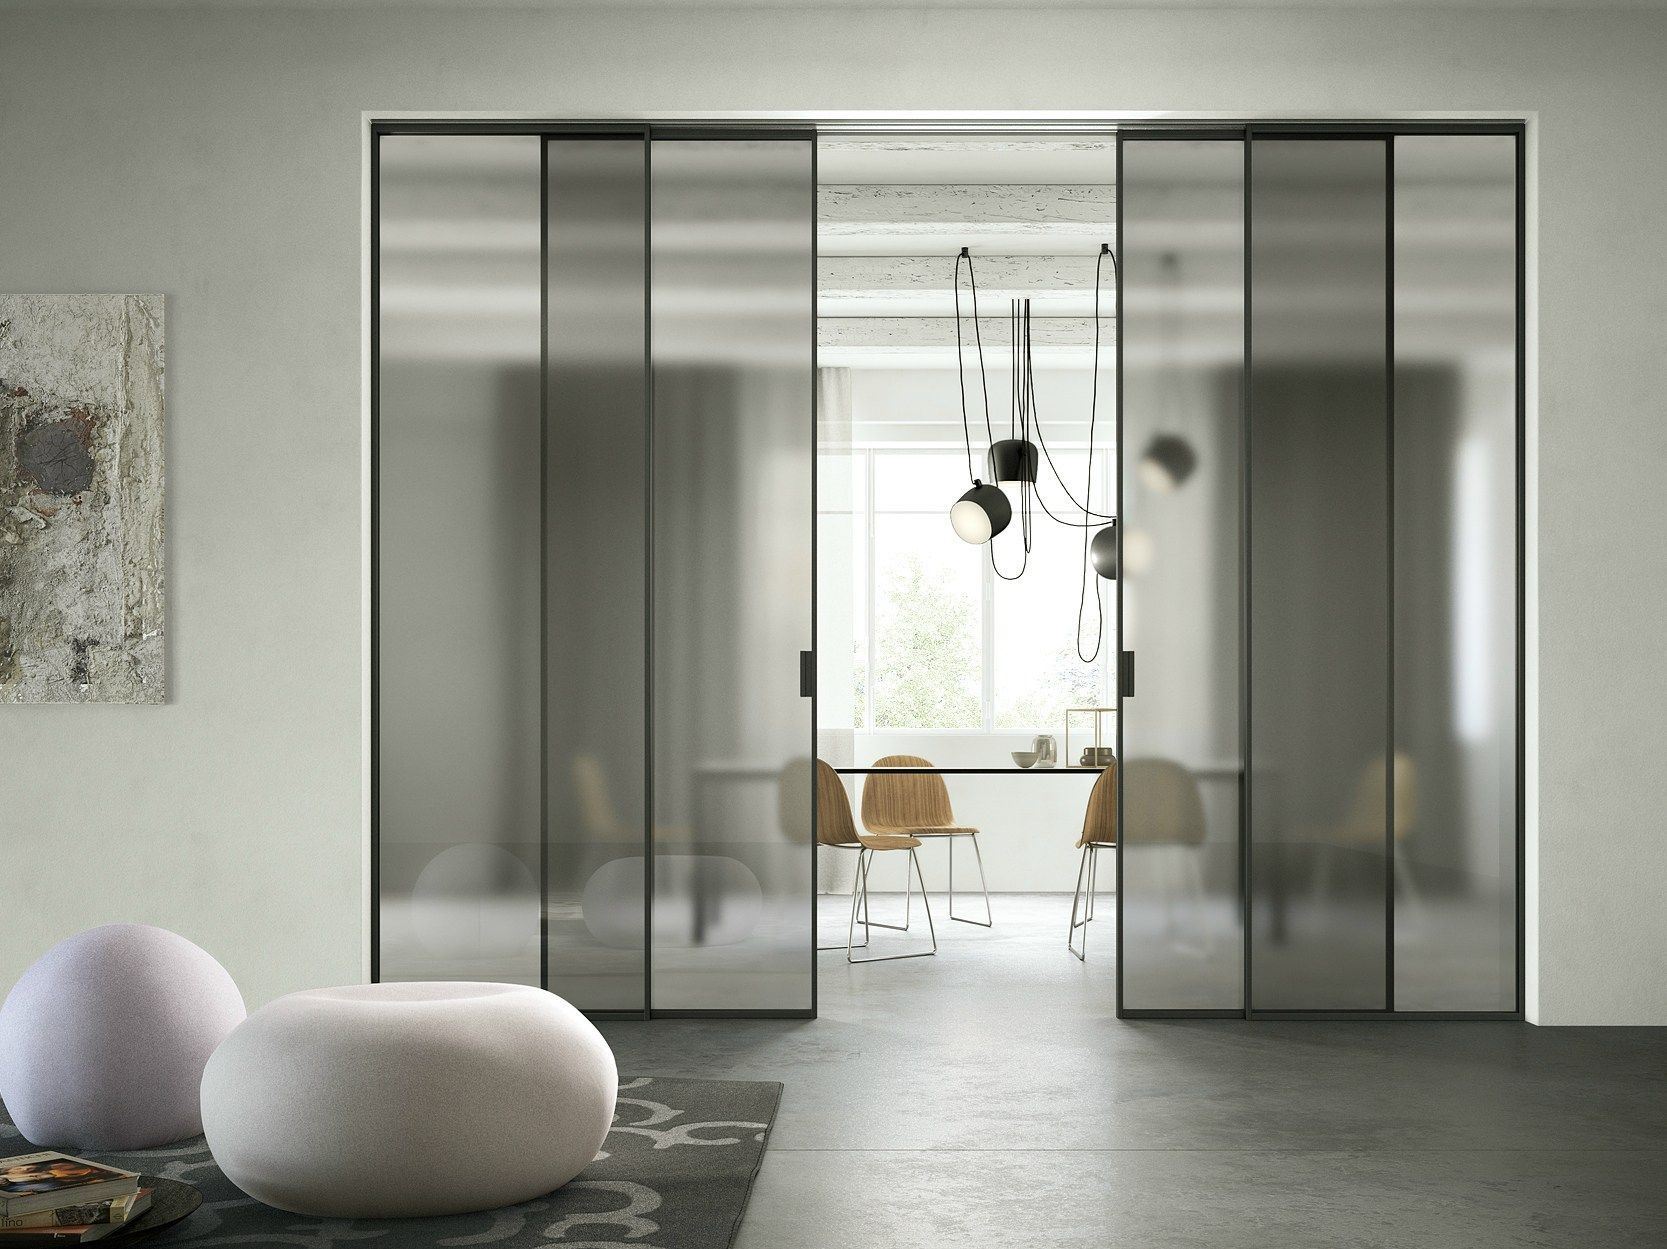 Tempered Glass Contractor Malaysia Door Window In 2020 Movable Walls Interior Sliding Glass Door